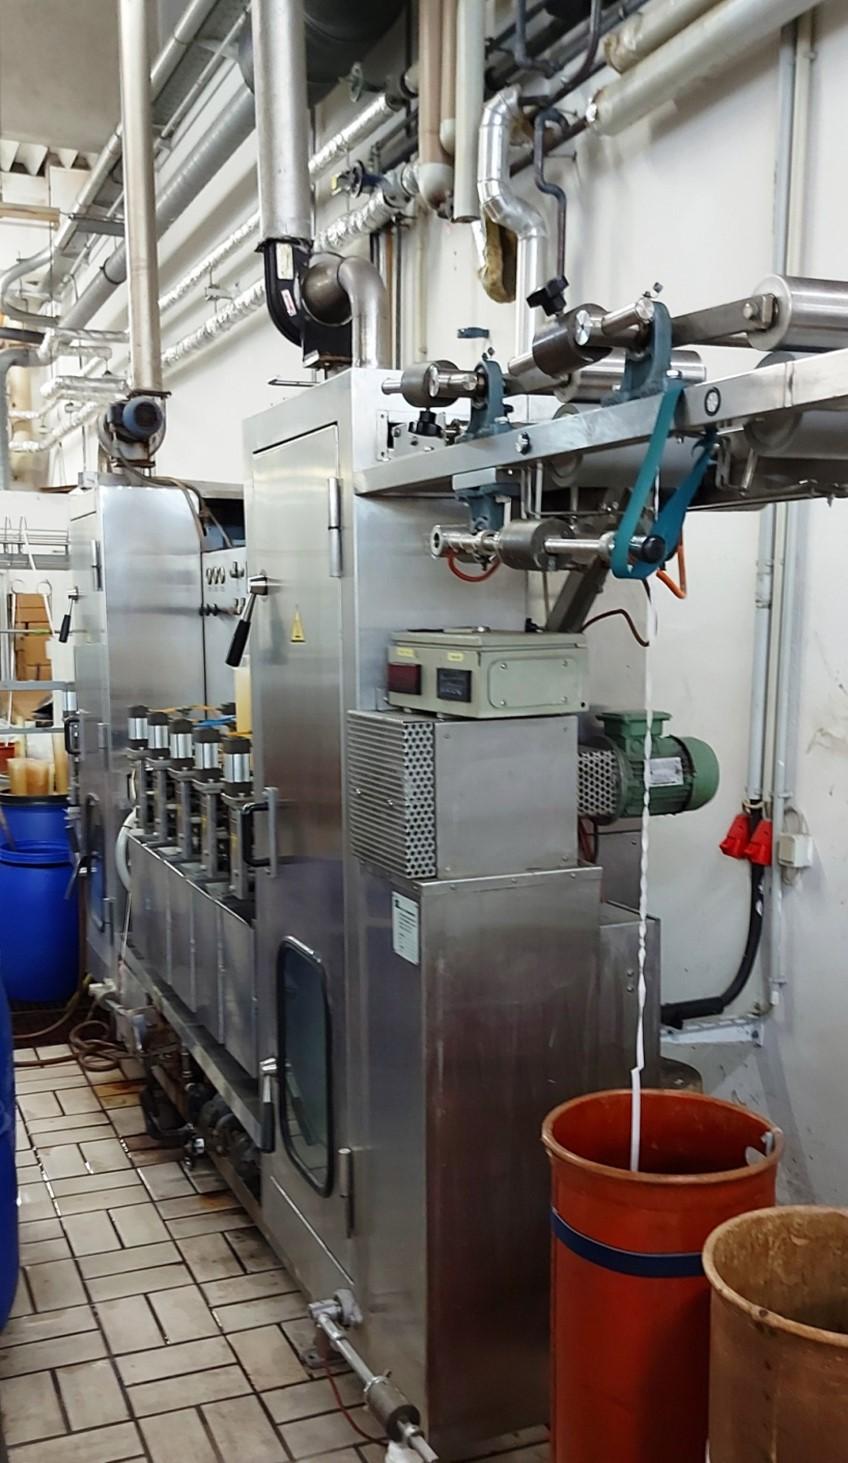 Breitenbach Continual dyeing machine